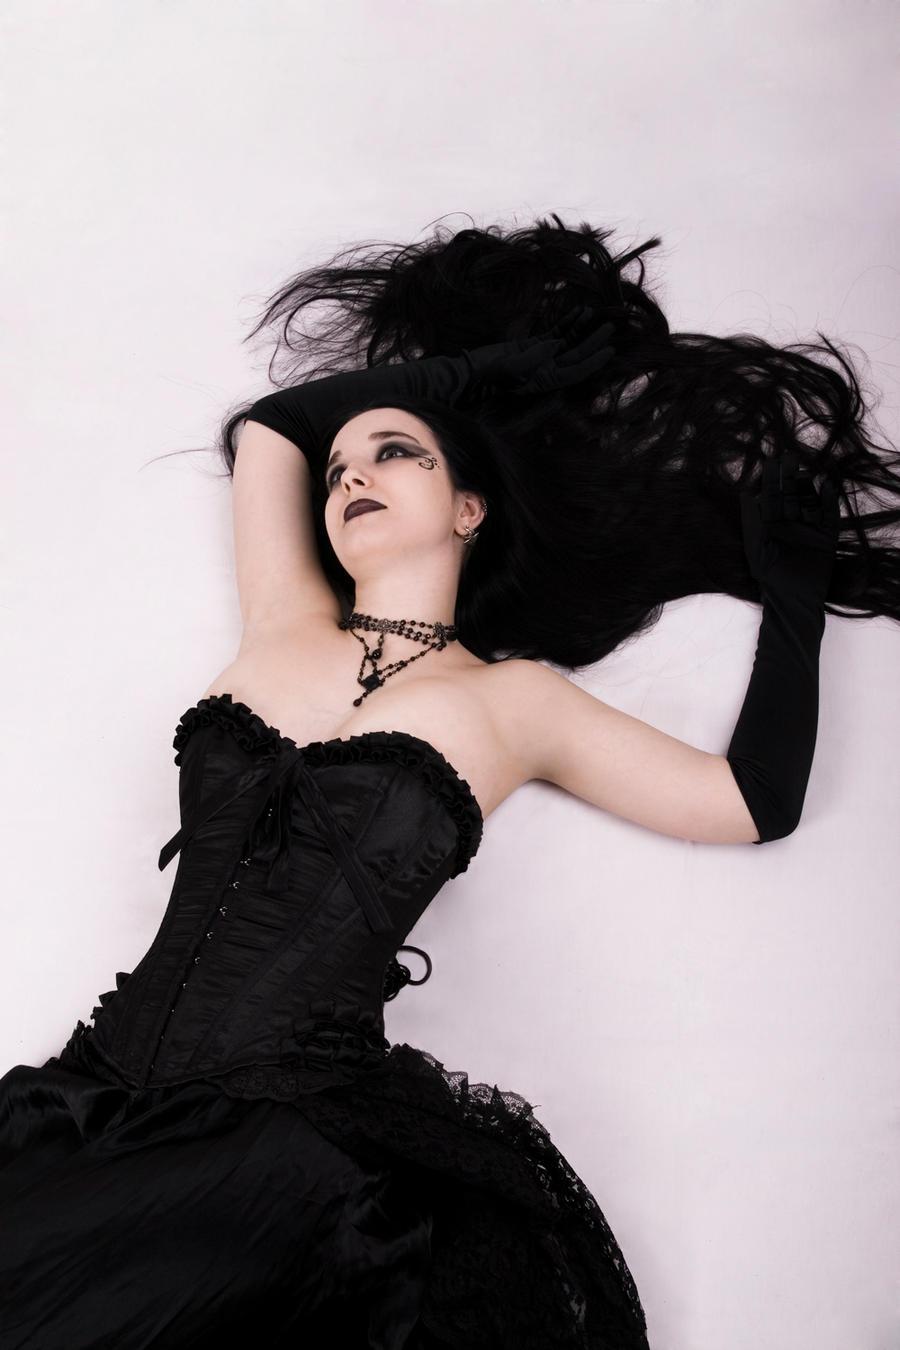 Model Female IX By TF-Stock On DeviantArt